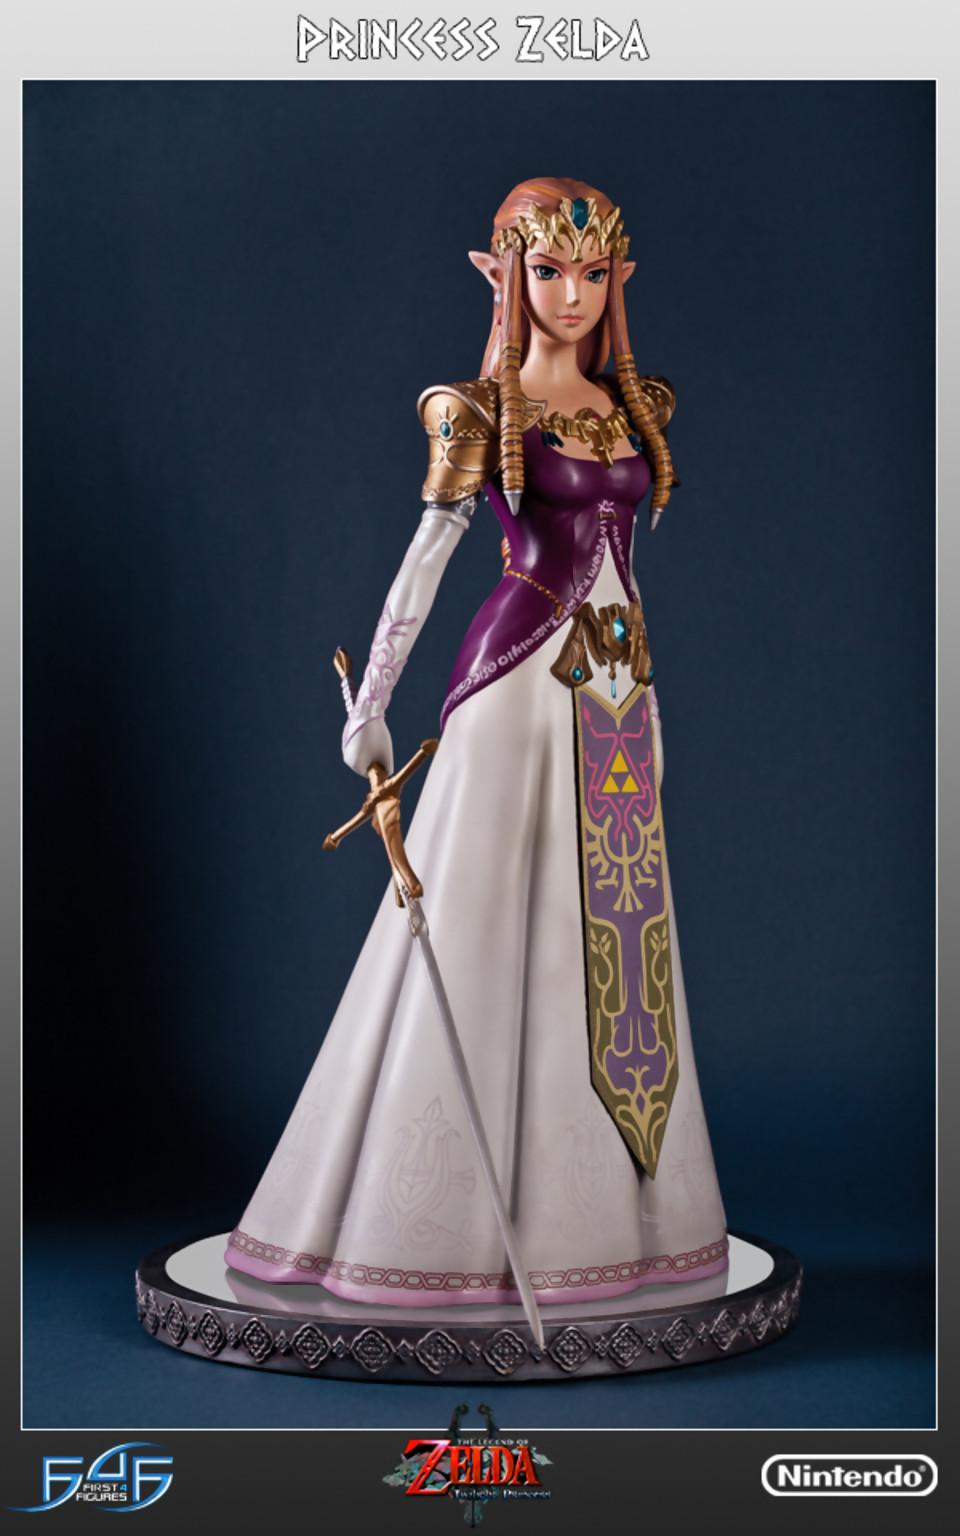 Zelda une statue de la princesse 350 dollars - La princesse zelda ...